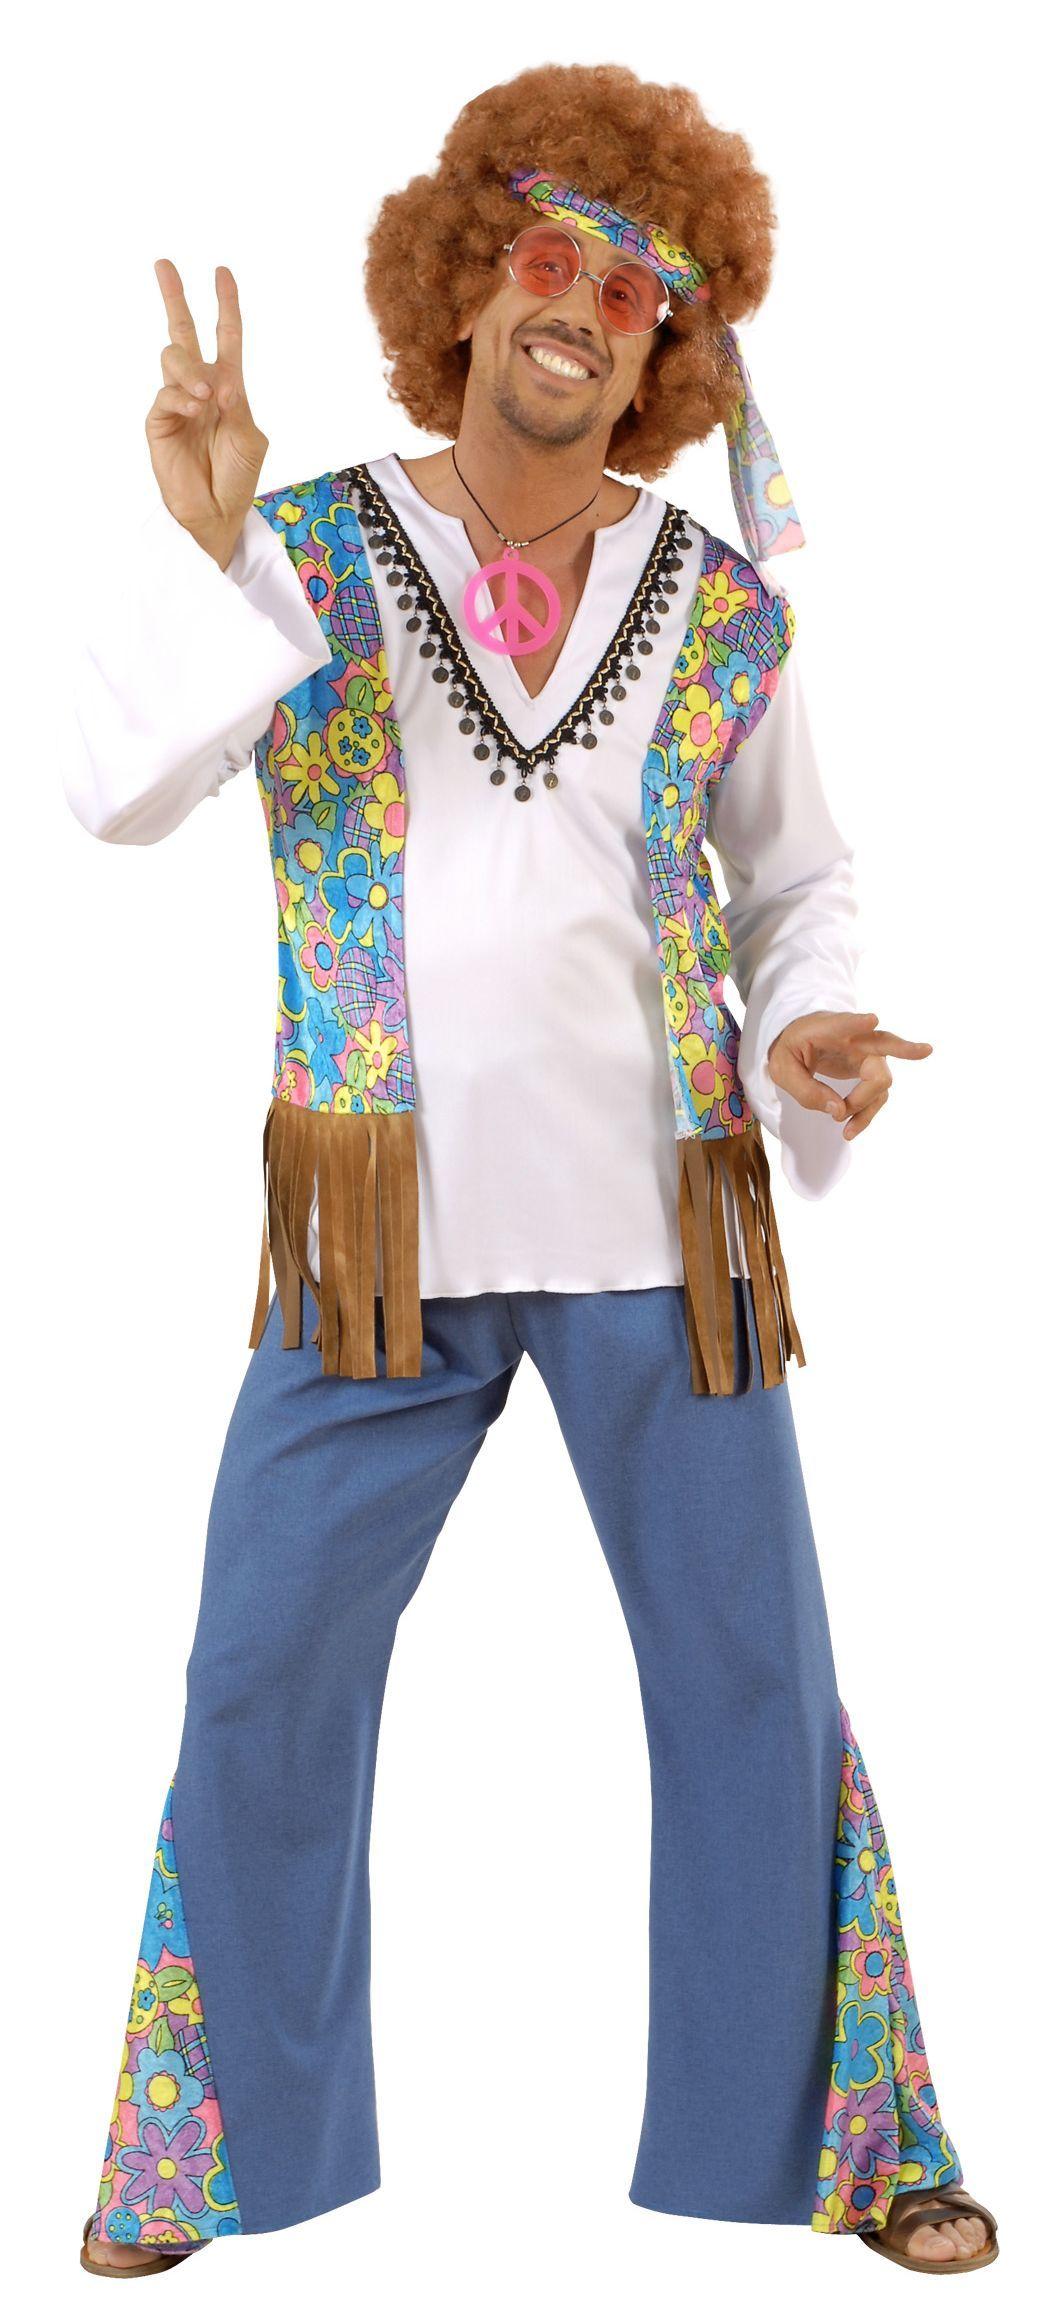 best service 9b72c 838db Costume Hippy Afro per uomo | festa anni 70 | Abiti hippie ...